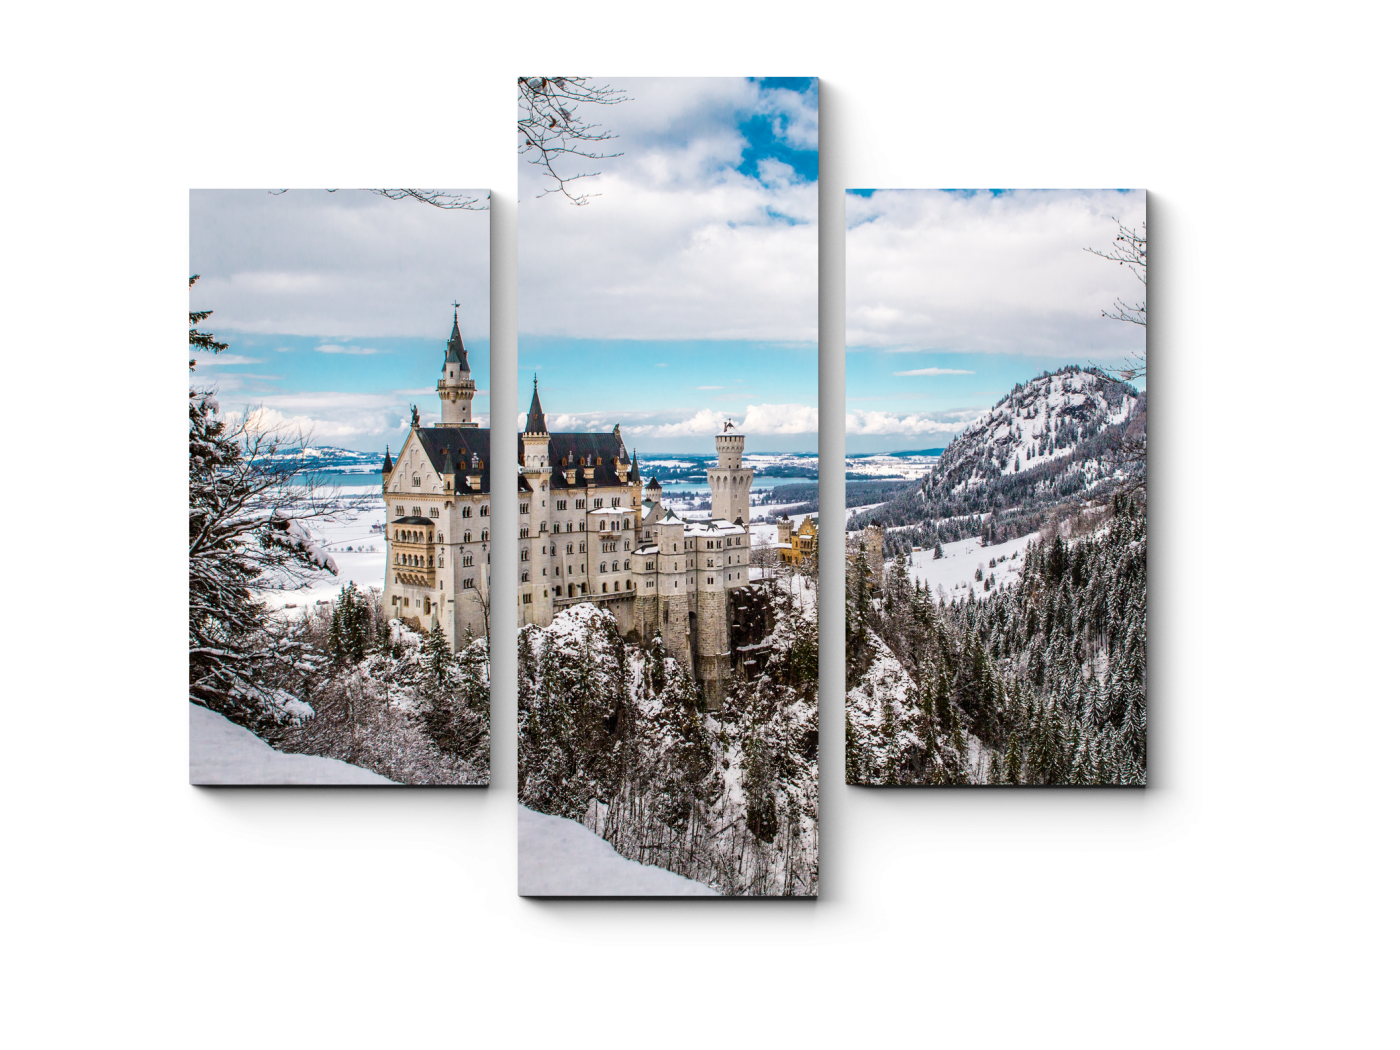 Модульная картина Замок Нойшванштайн в Германии зимой (60x54) фото